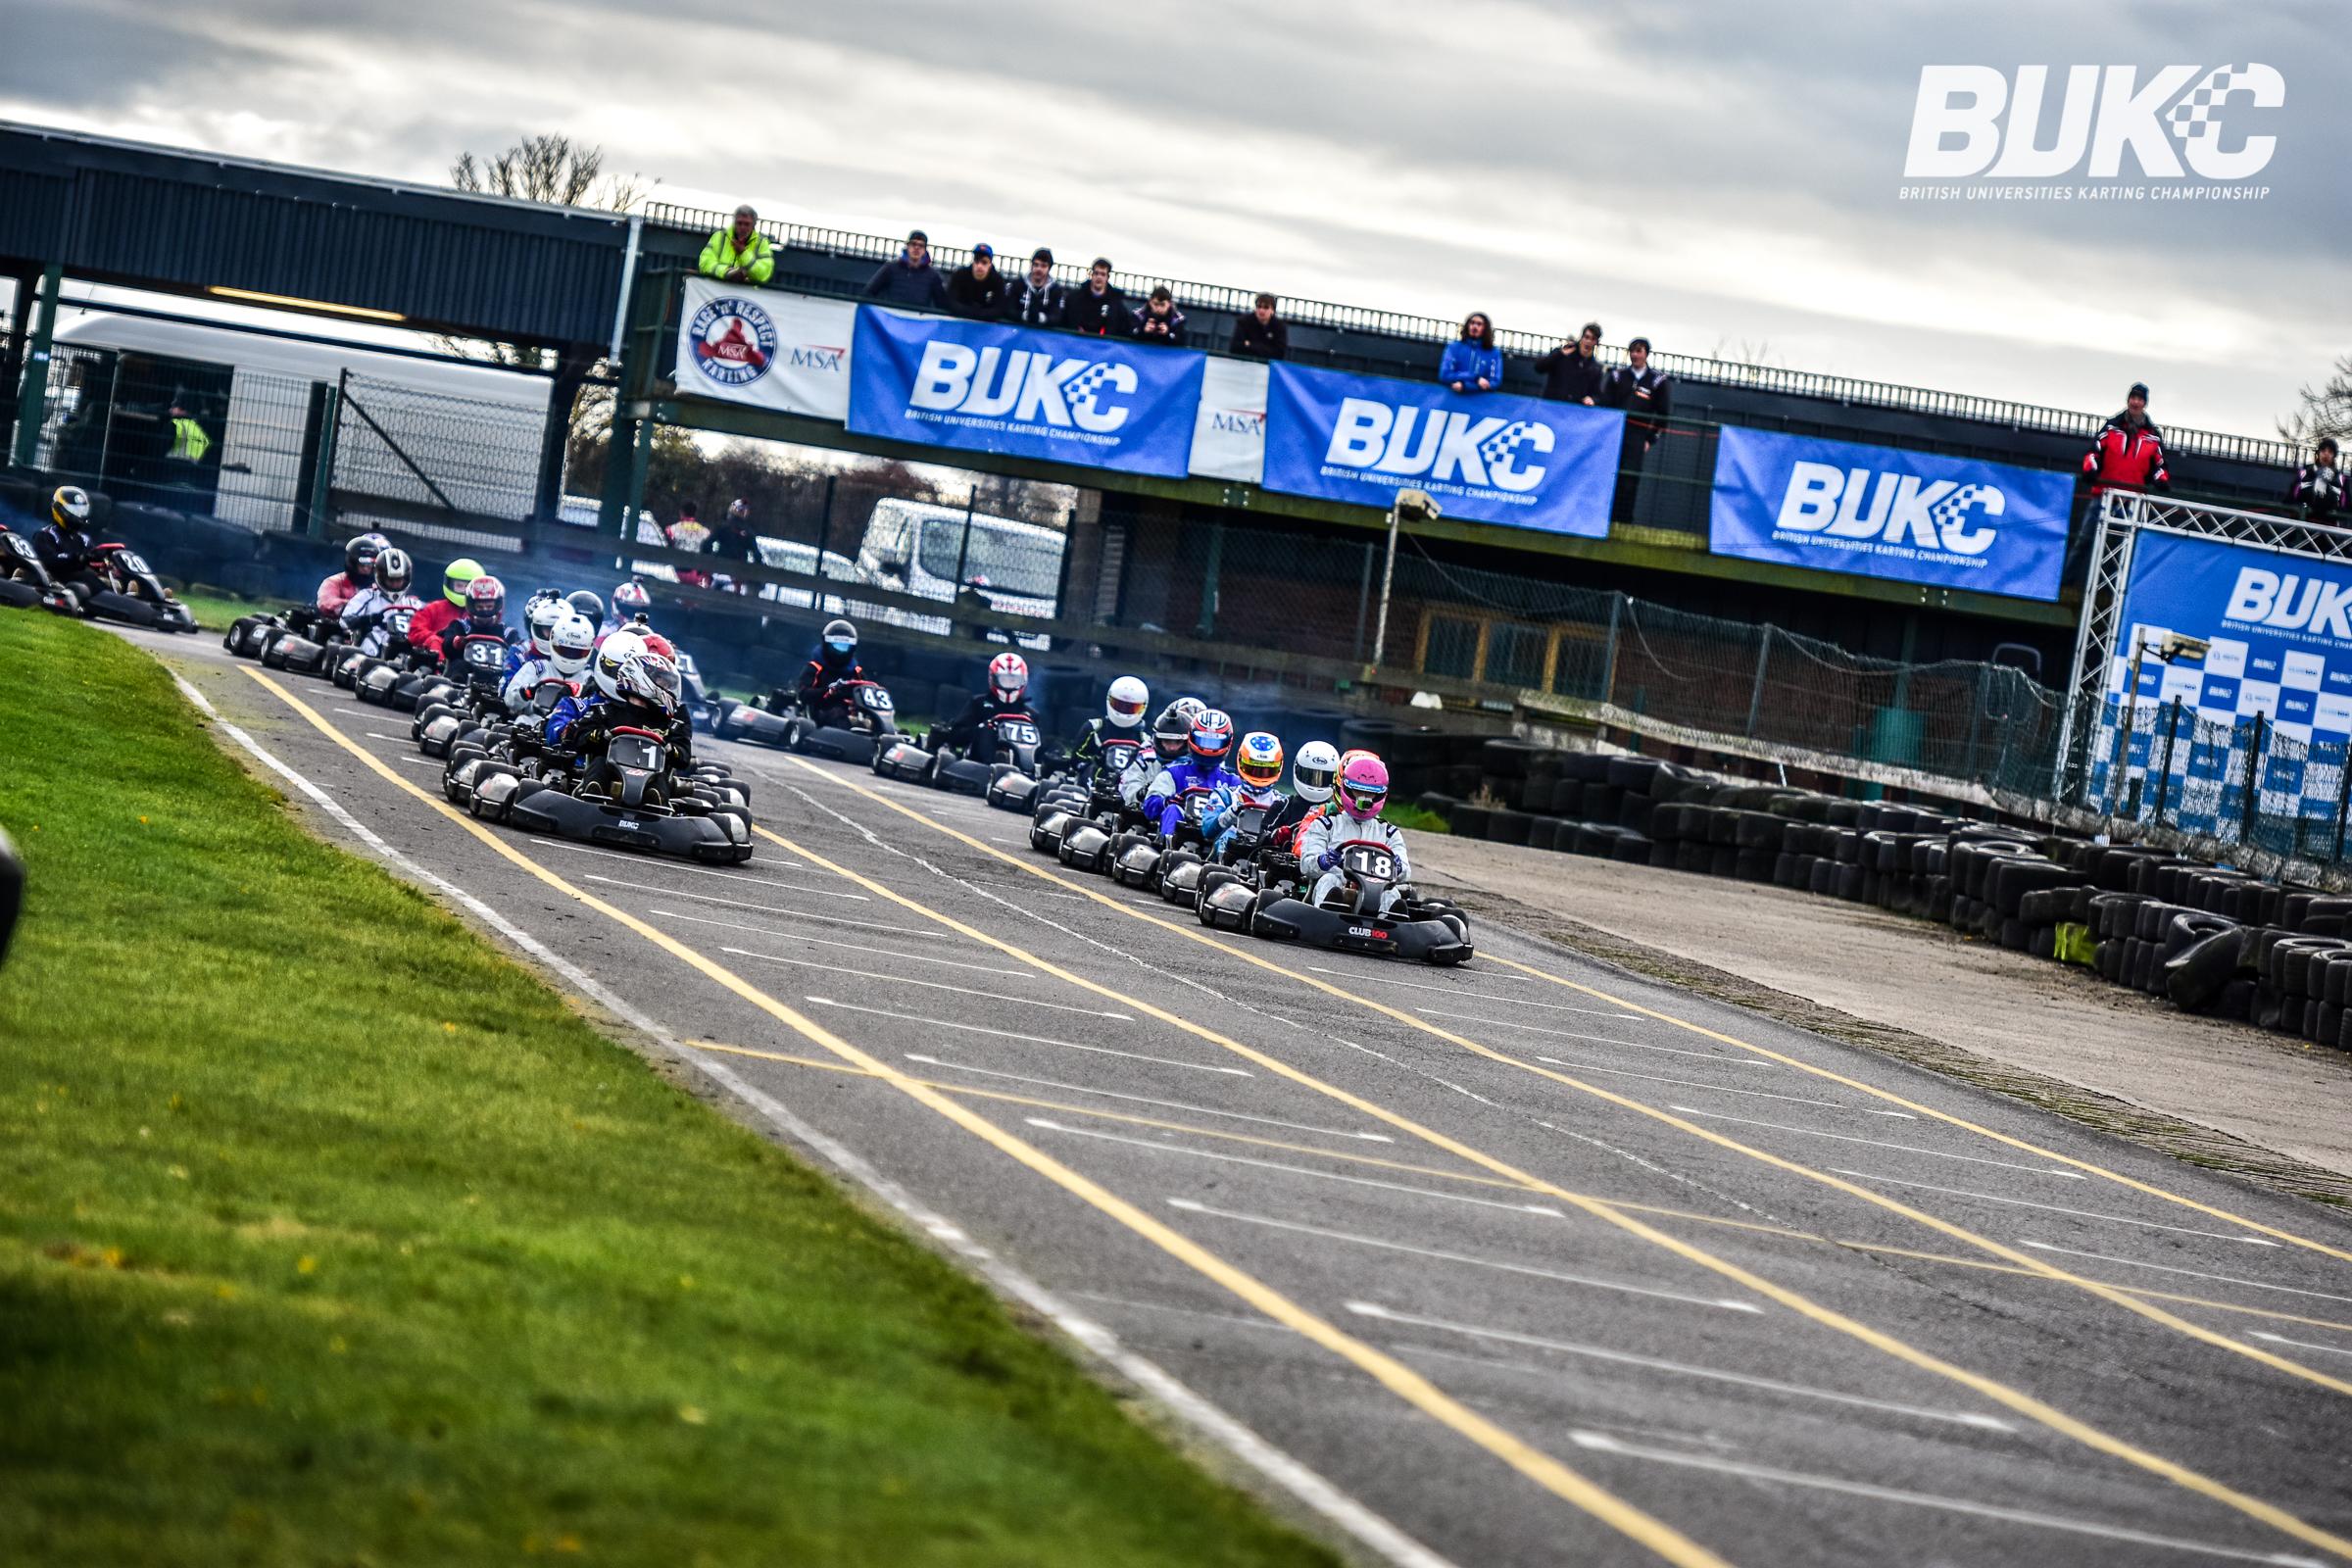 KU Karting Society qualifies for British Universities Karting Championship